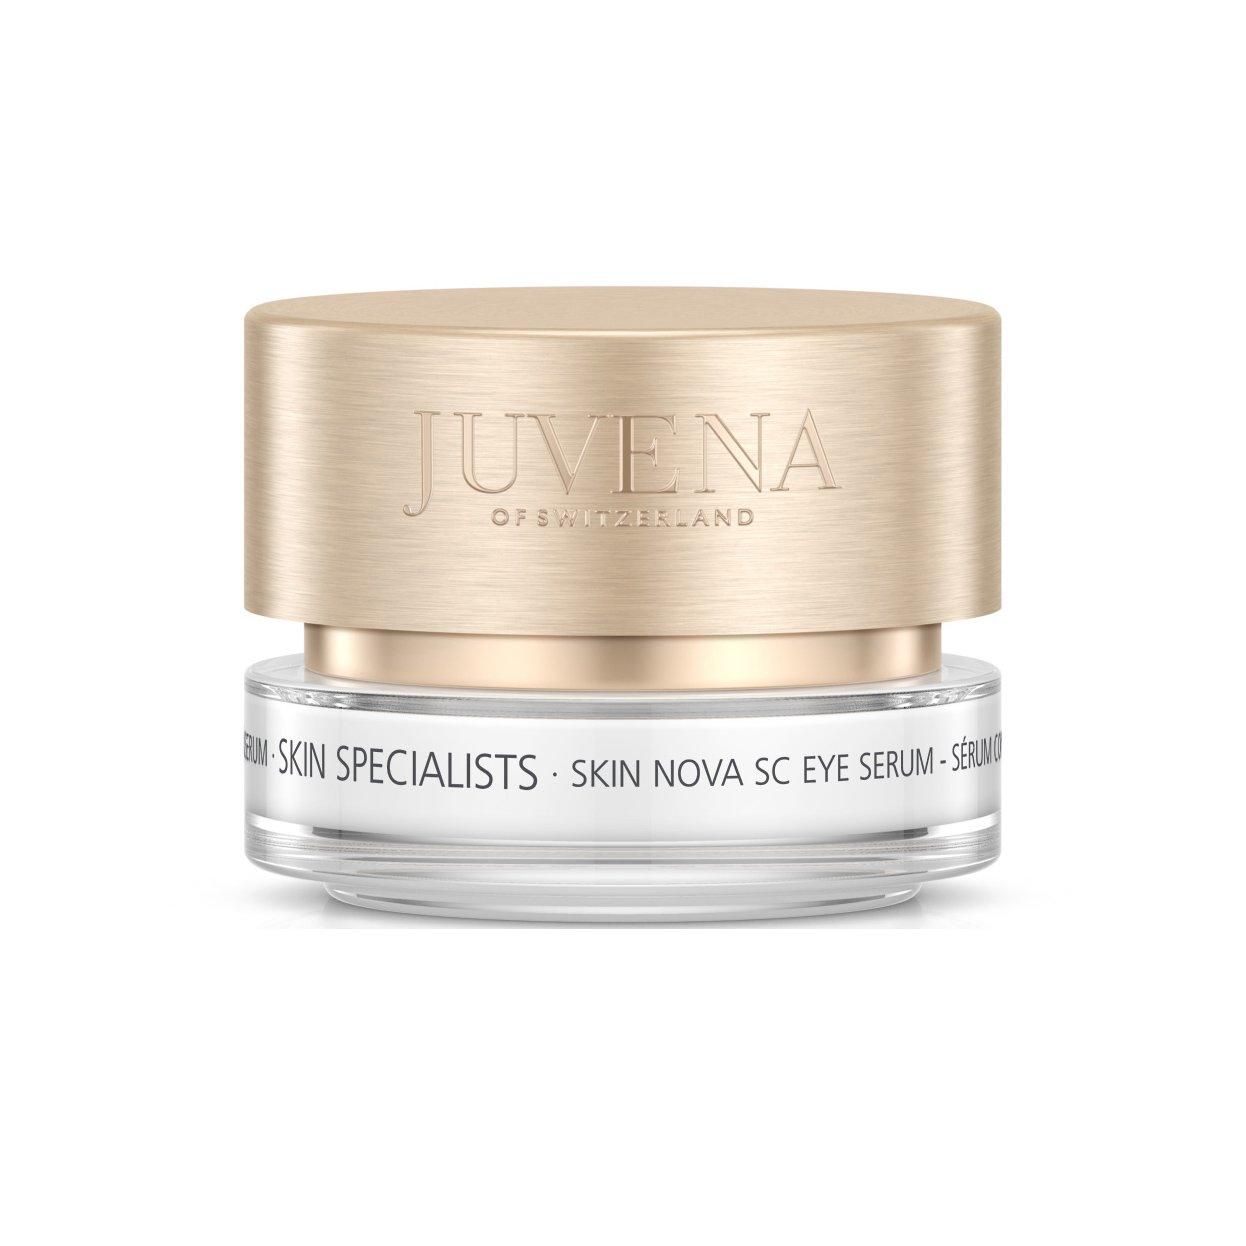 Juvena Skin Specialists Skin Nova SC Eye Serum Ορός – Συμπύκνωμα για την Ολική Ανάπλαση της Ευαίσθητης Περιοχής των Ματιών 15ml